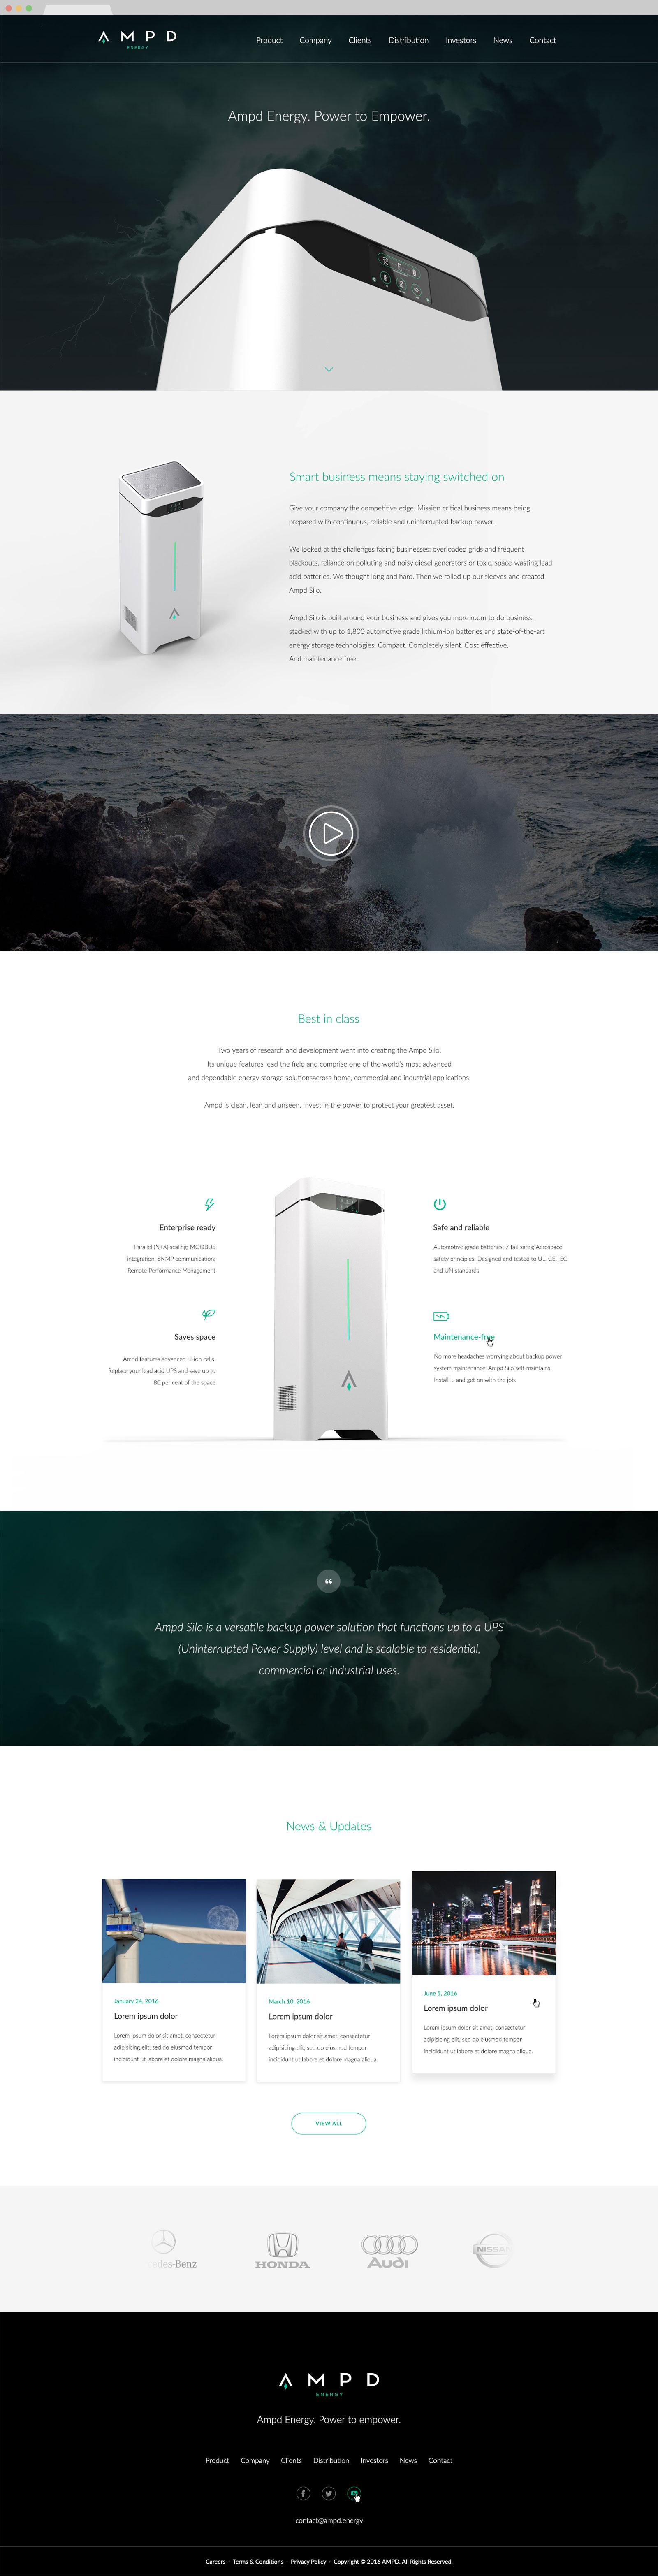 web design ampd 01